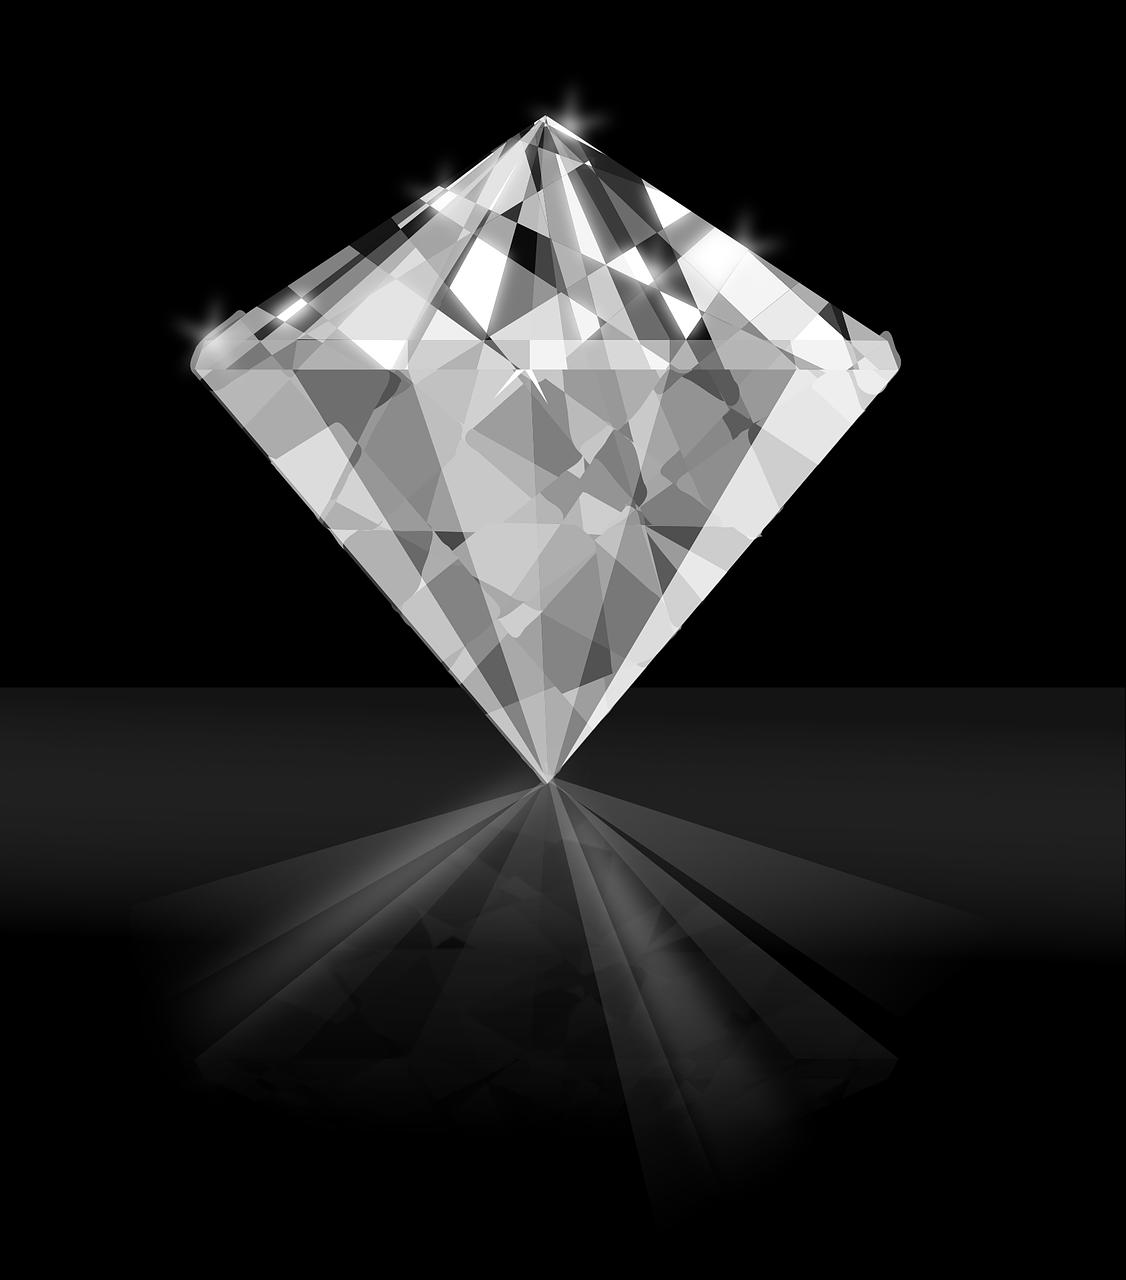 A single diamond.